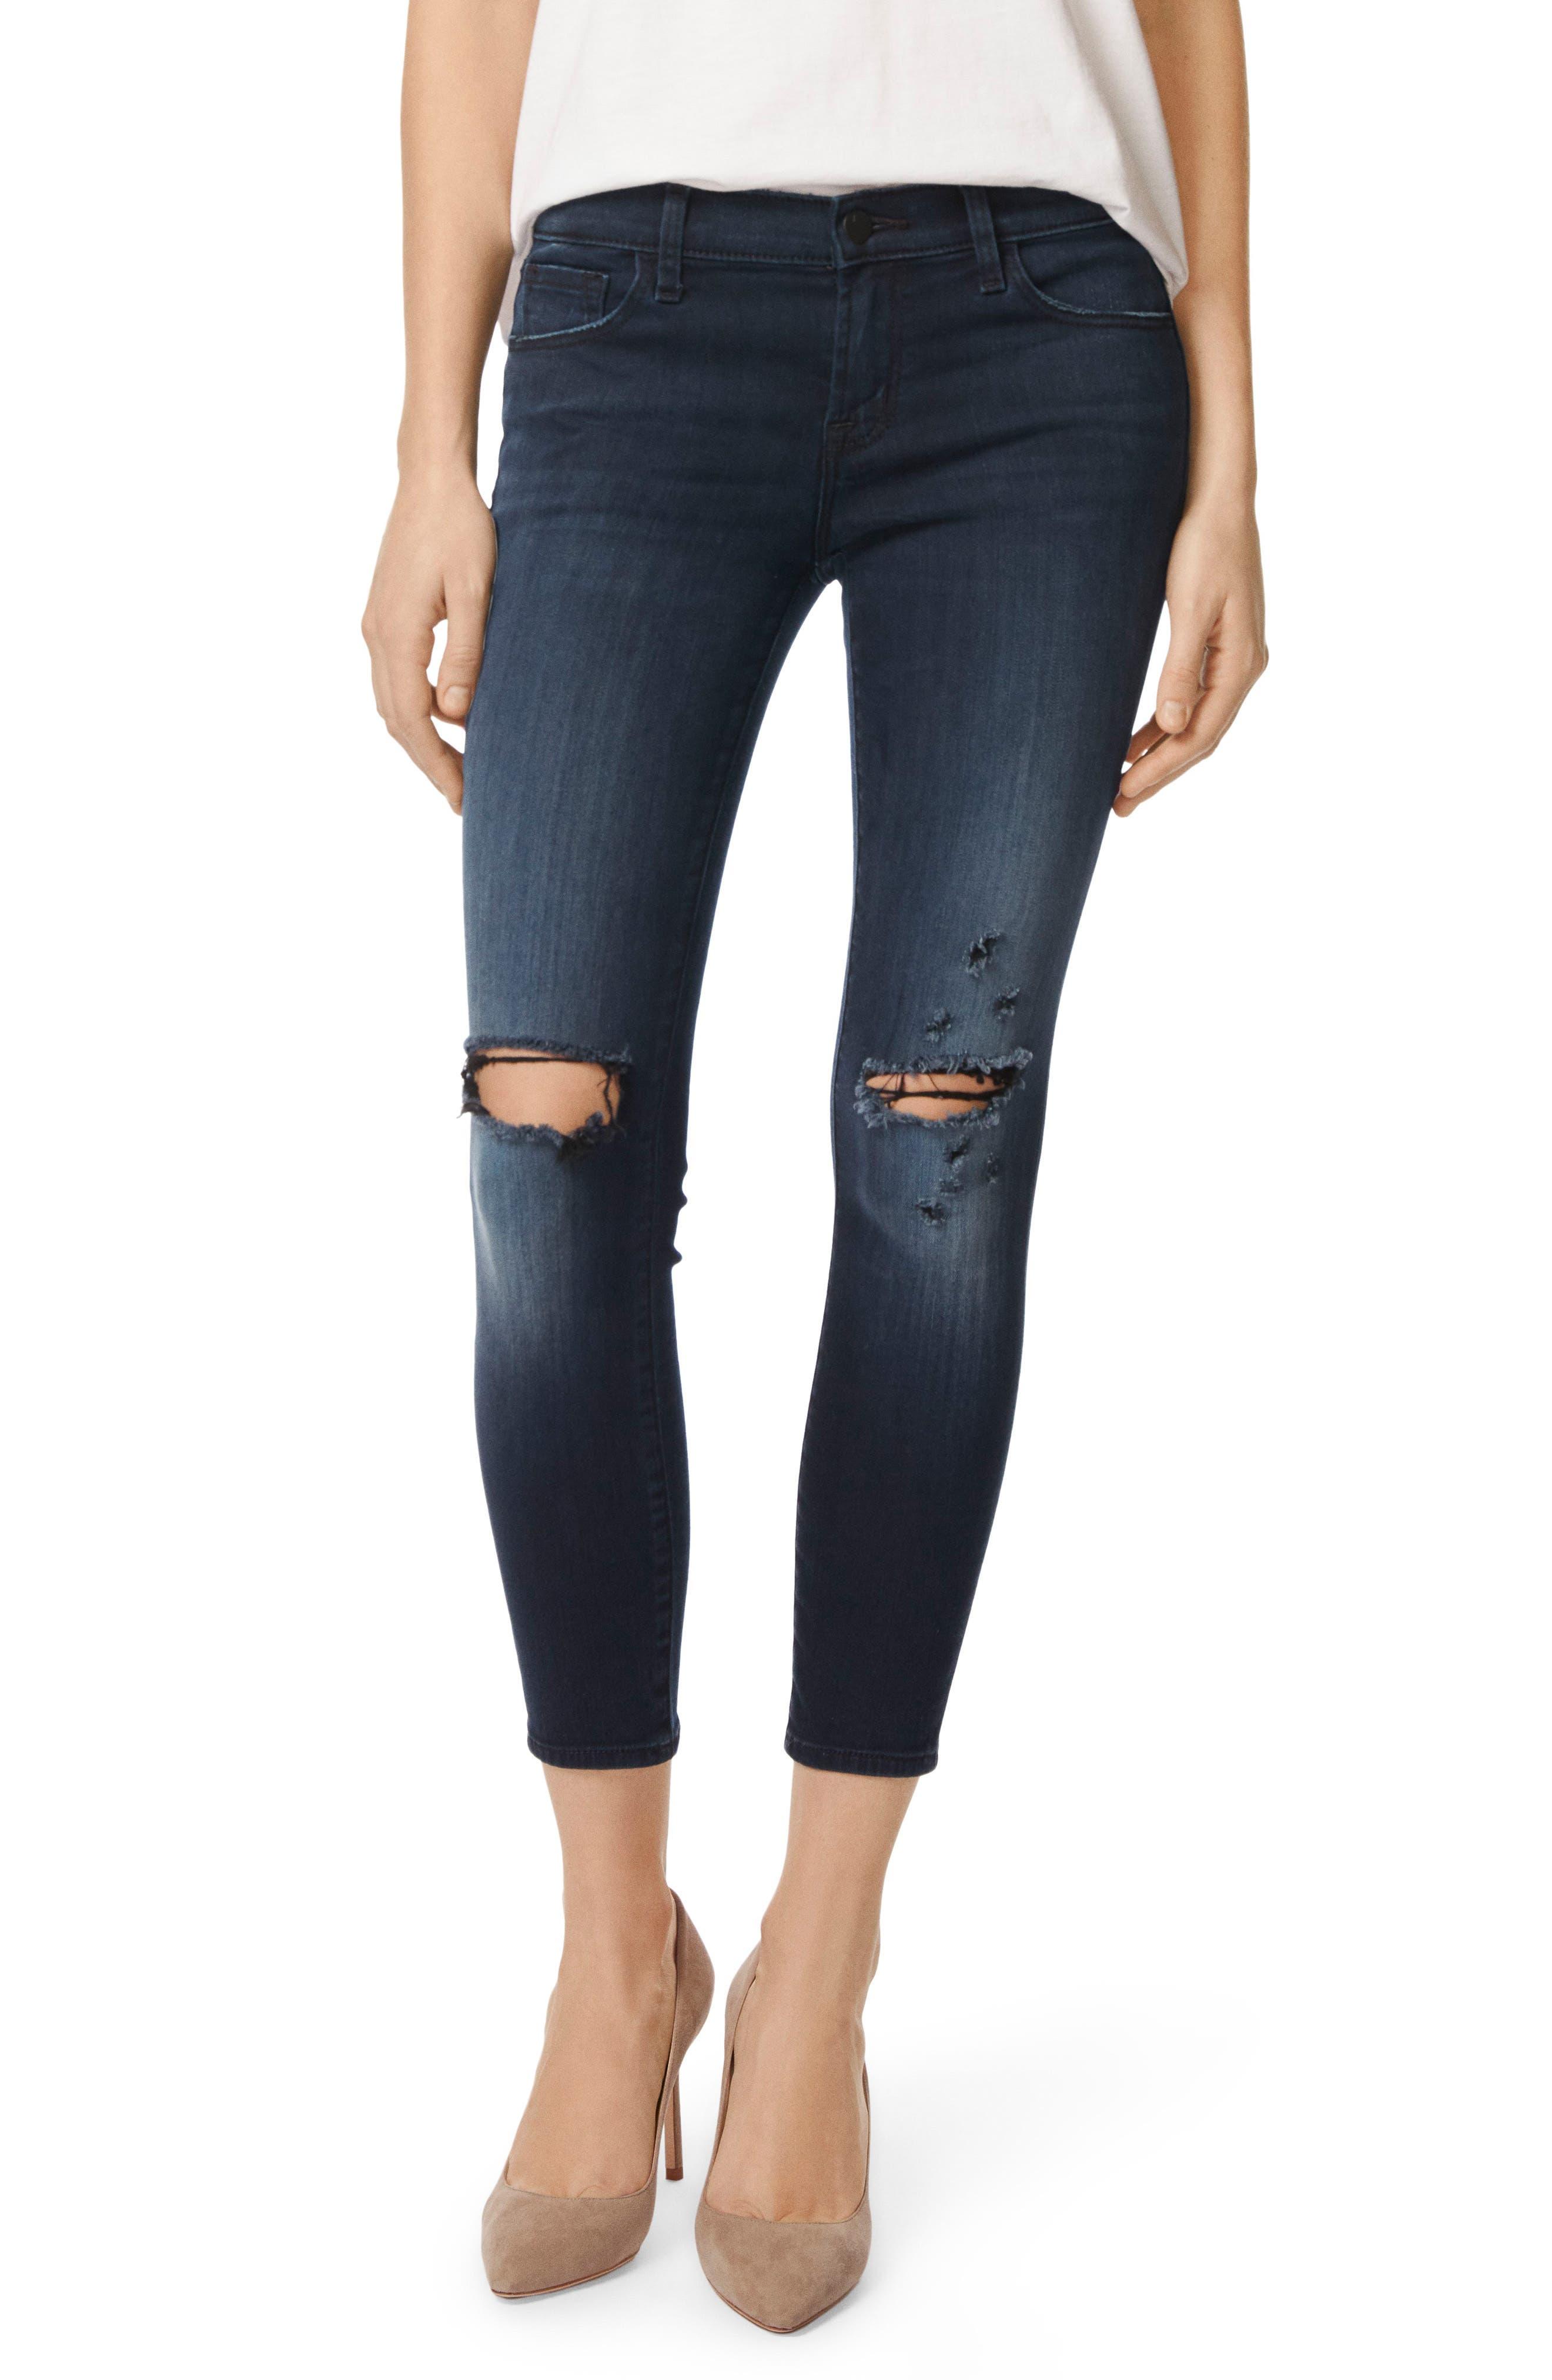 Alternate Image 1 Selected - J Brand 9326 Low Rise Crop Skinny Jeans (Black Sea)